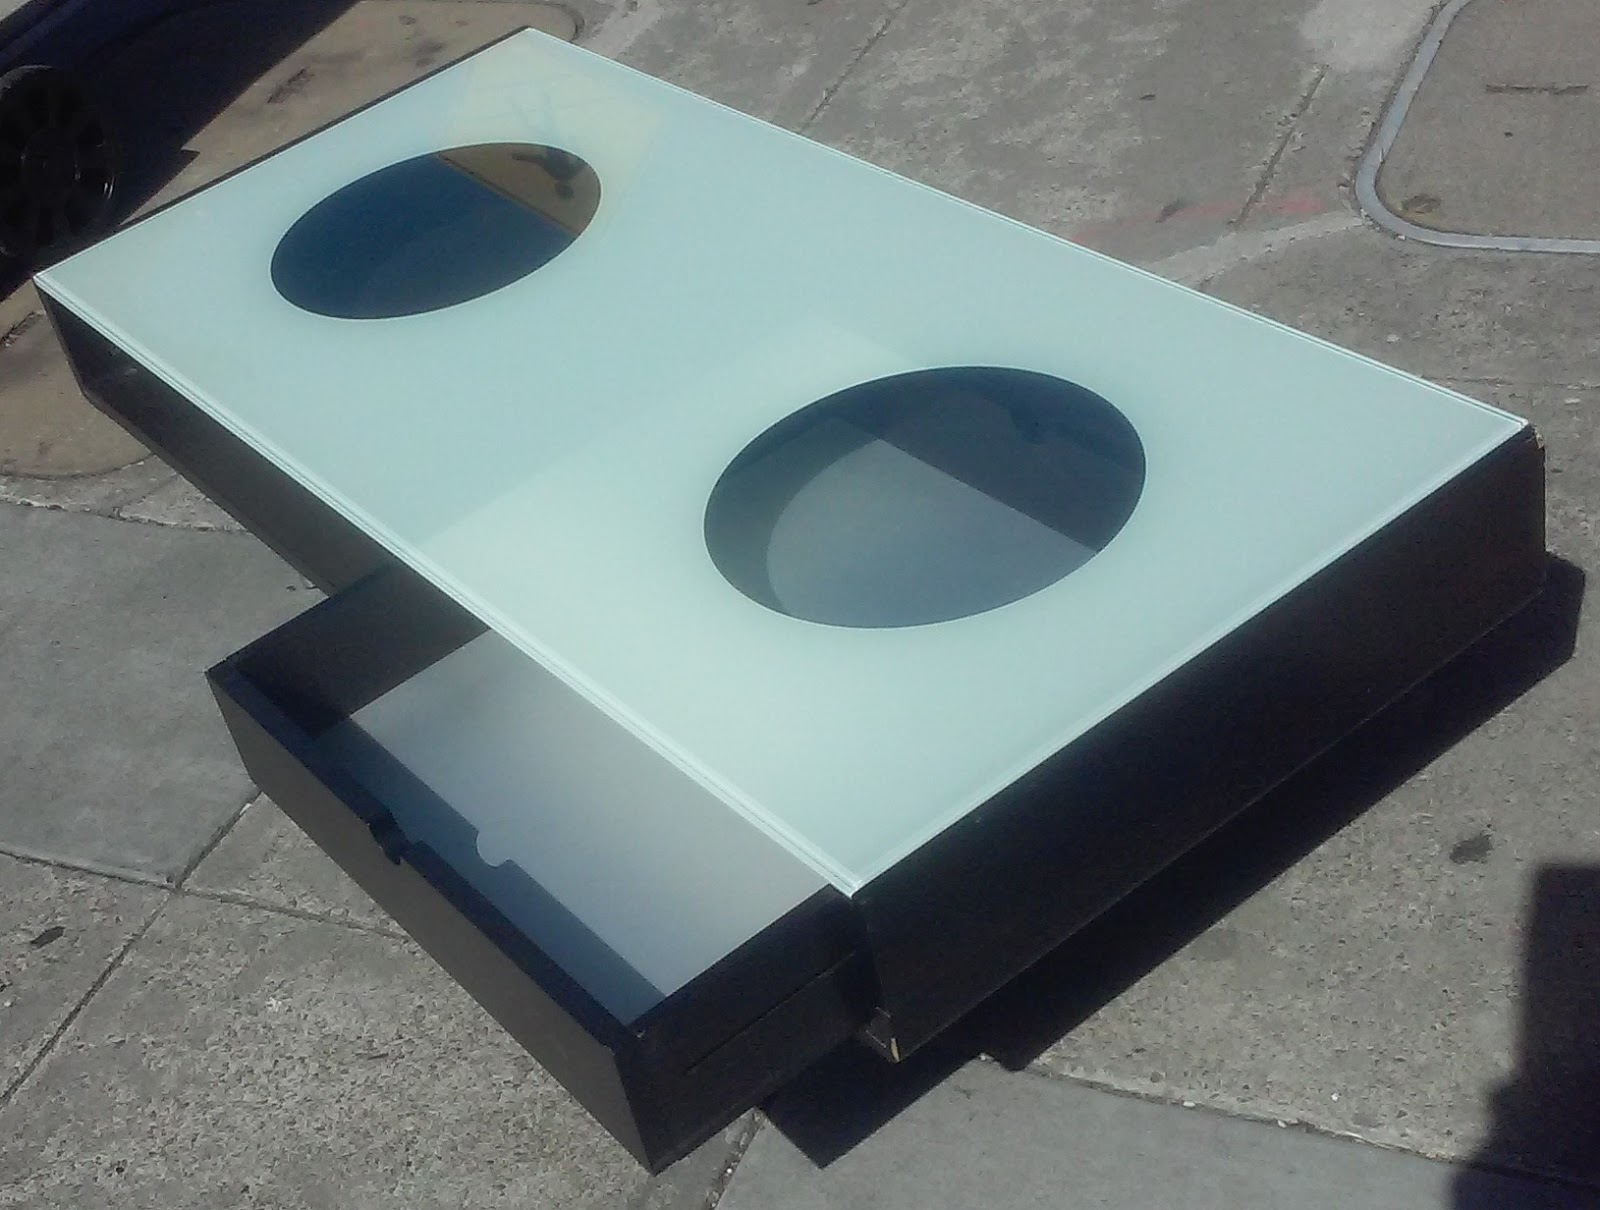 UHURU FURNITURE & COLLECTIBLES 6620 Modern Glass Top 4 Wide